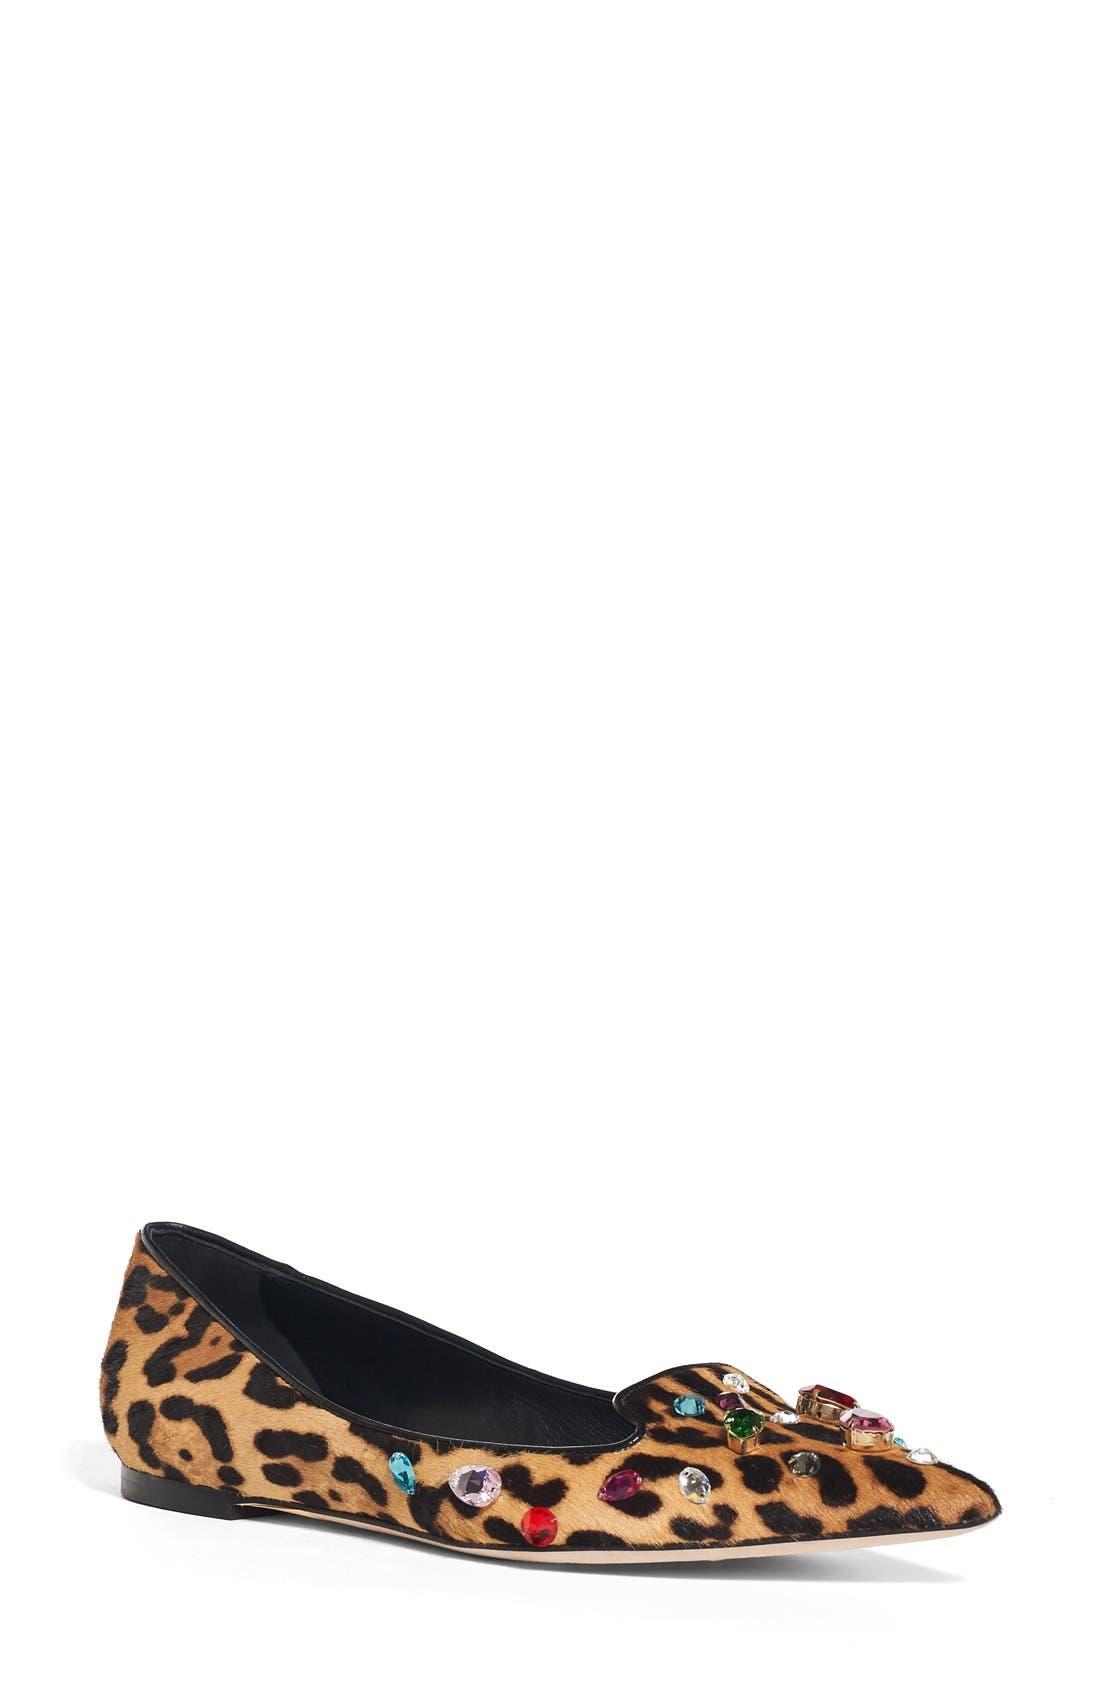 Main Image - Dolce&Gabbana Leo Embellished Leopard Print Flat (Women)